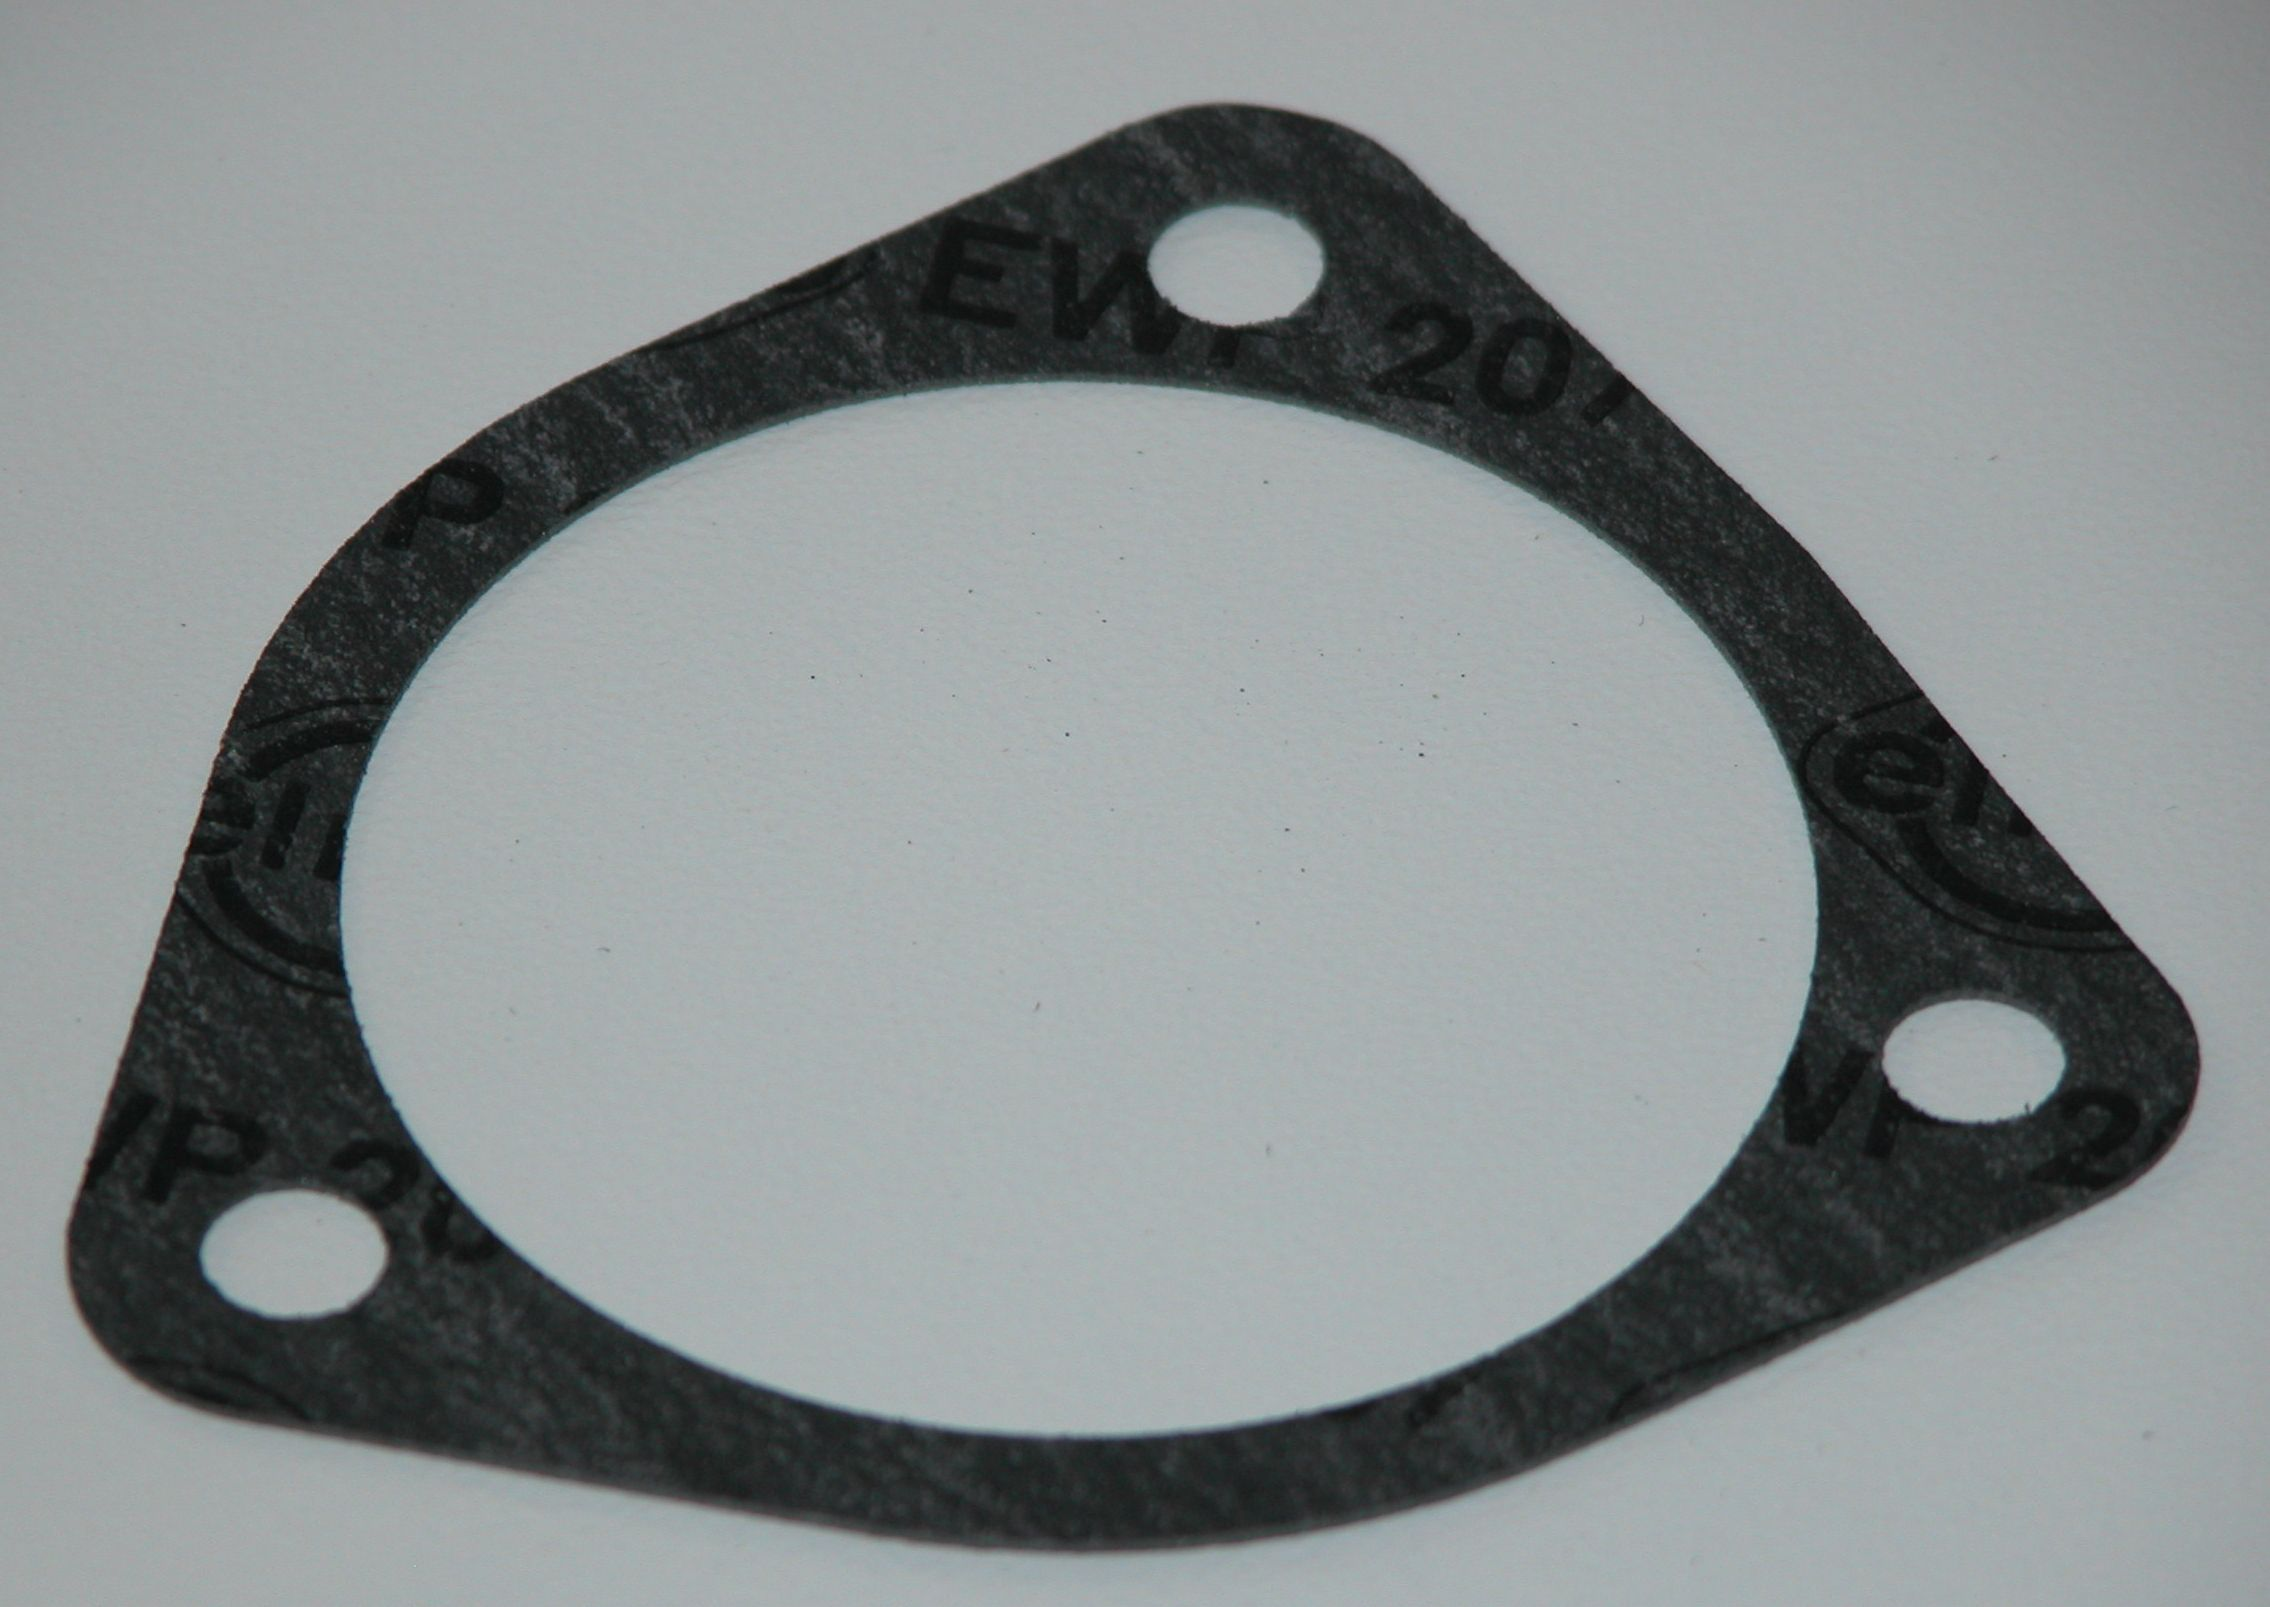 Ölfilterdeckeldichtung (Papier) BMW R 2 - Ventiler